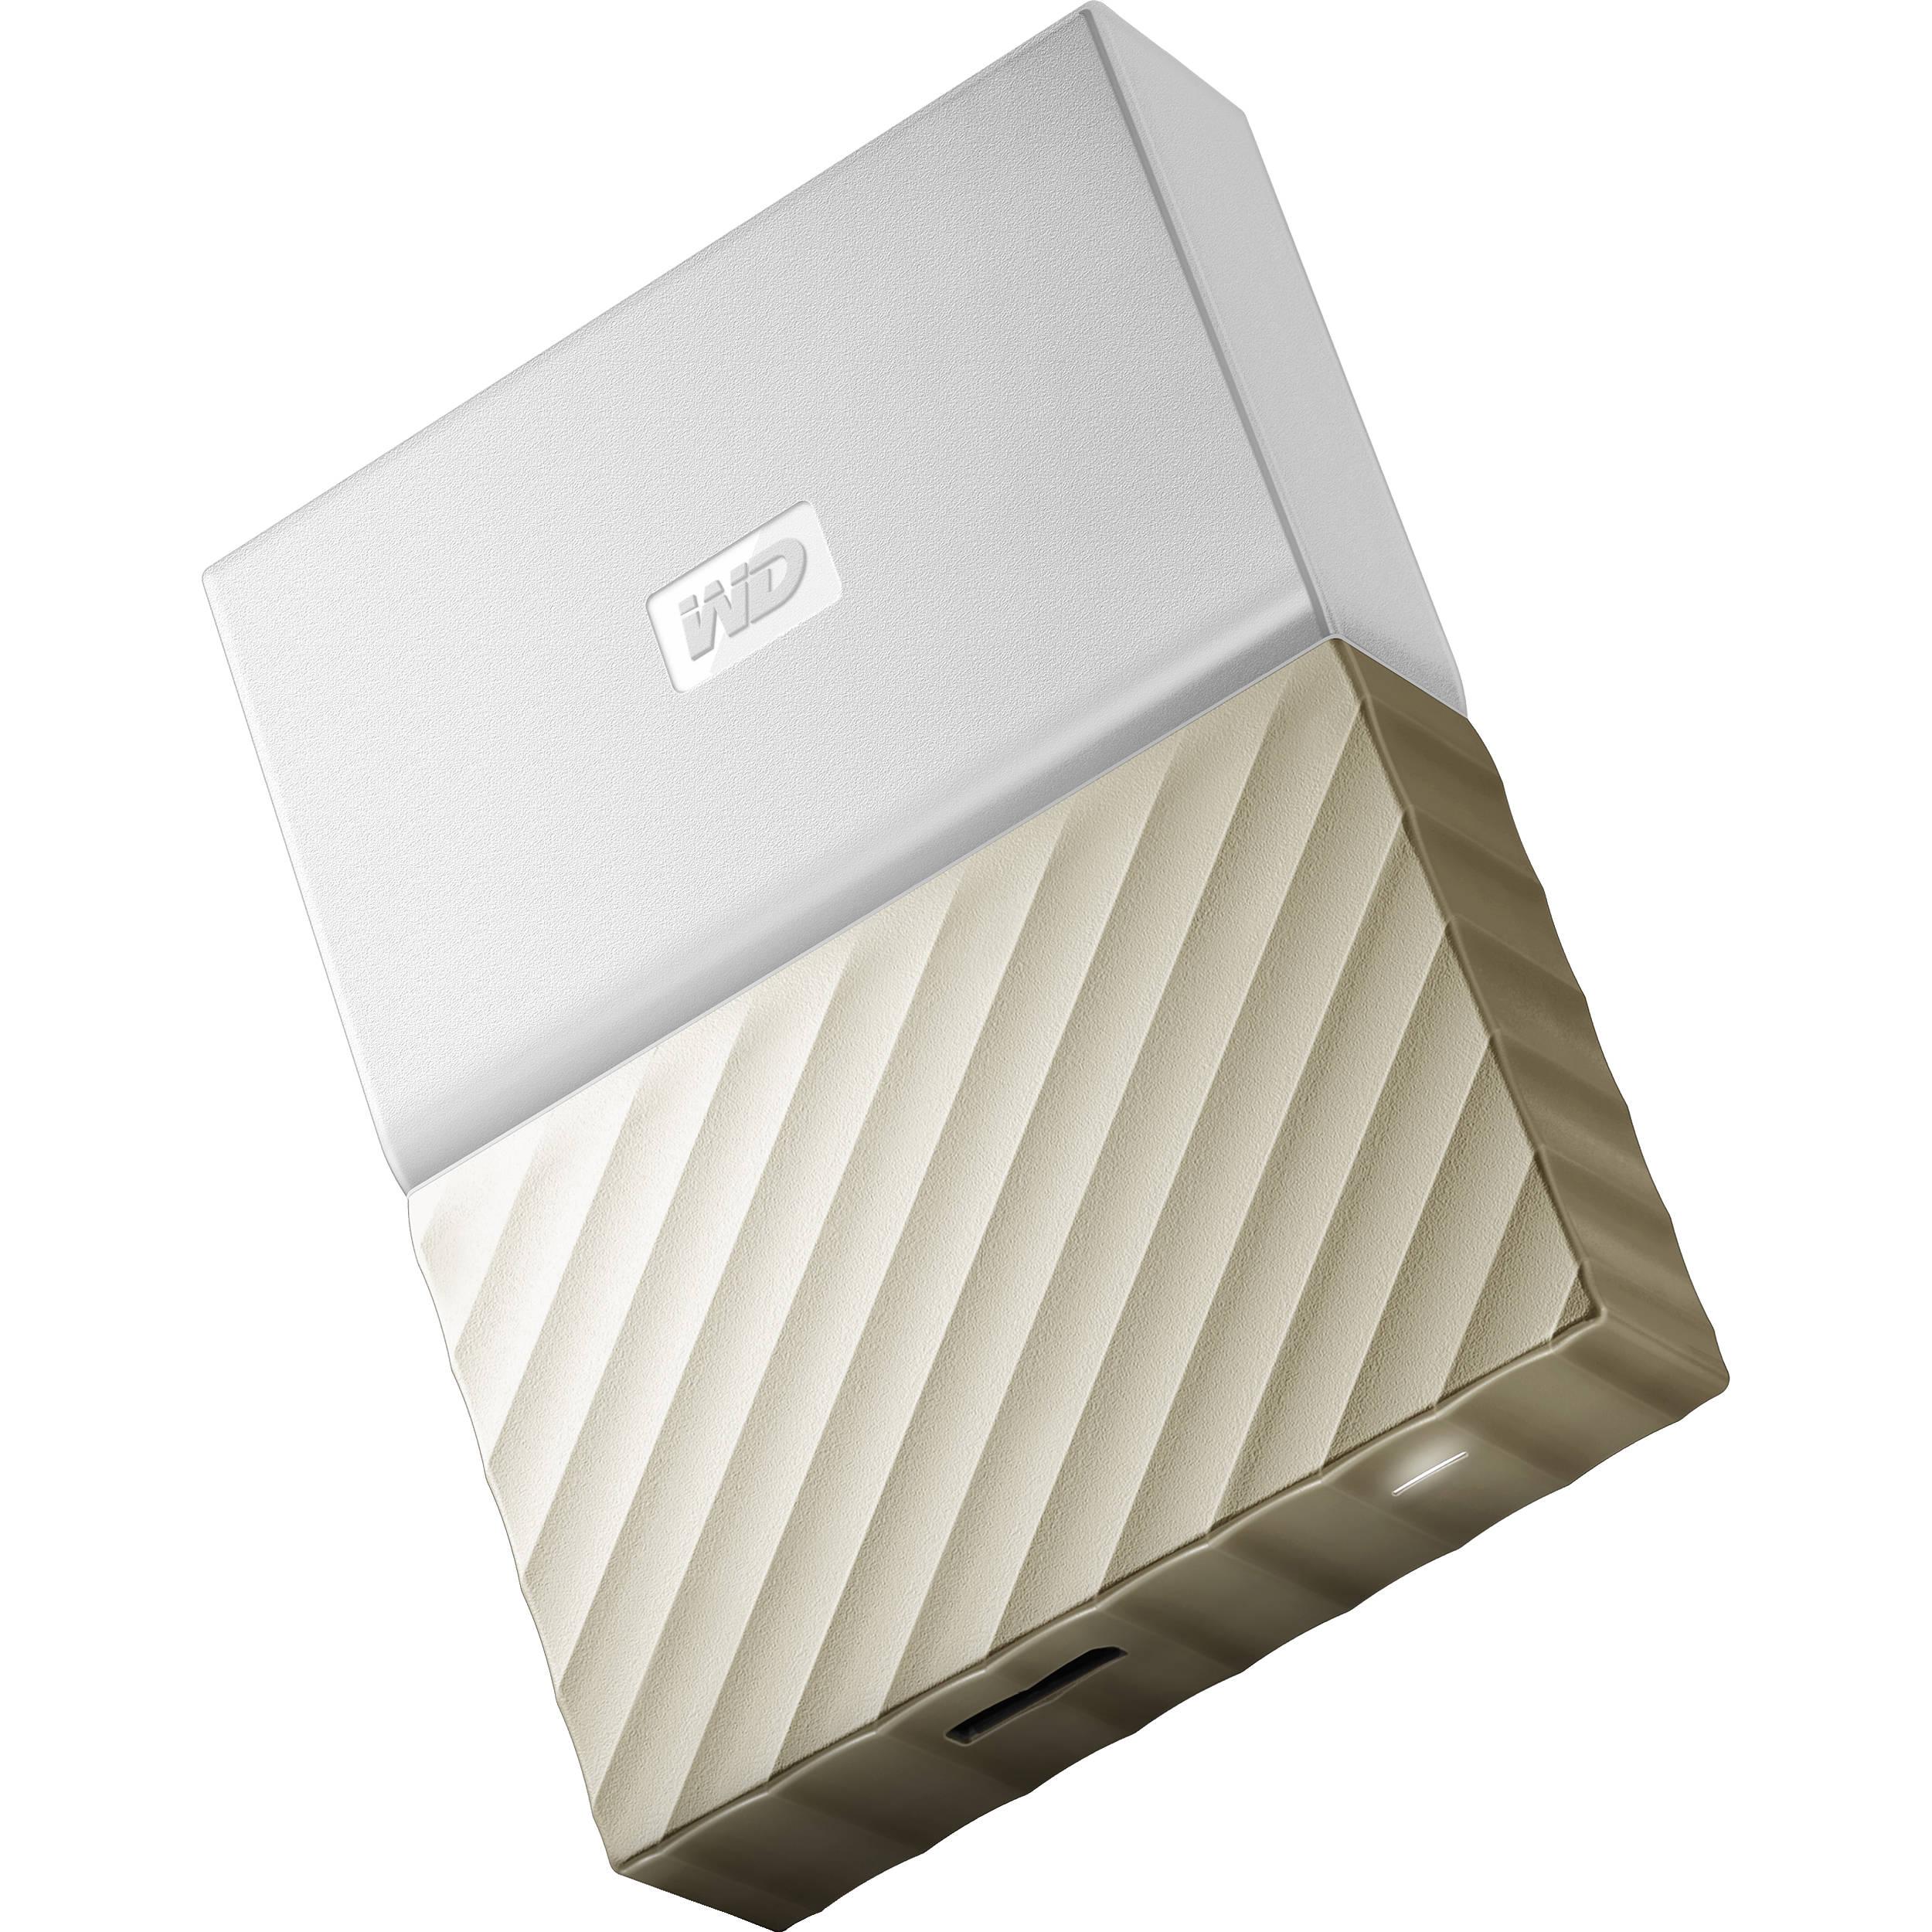 WD 3TB My Passport Ultra USB 3 0 External Hard Drive (White/Gold)